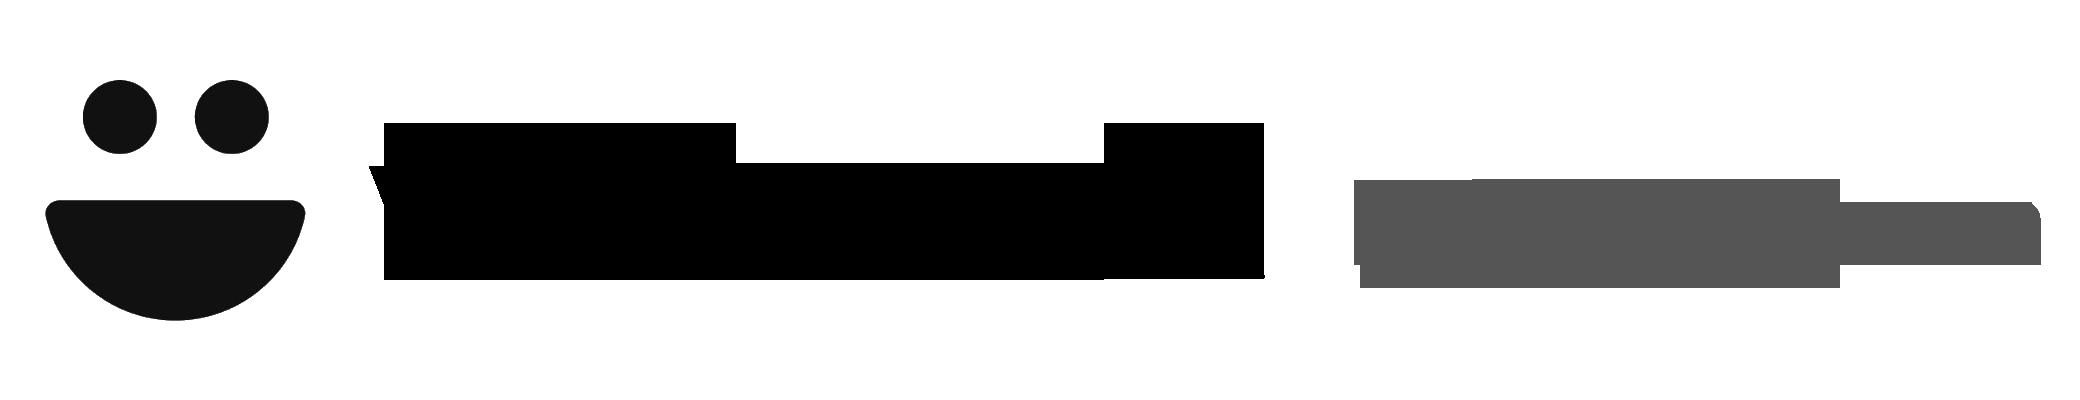 Videoask-logo